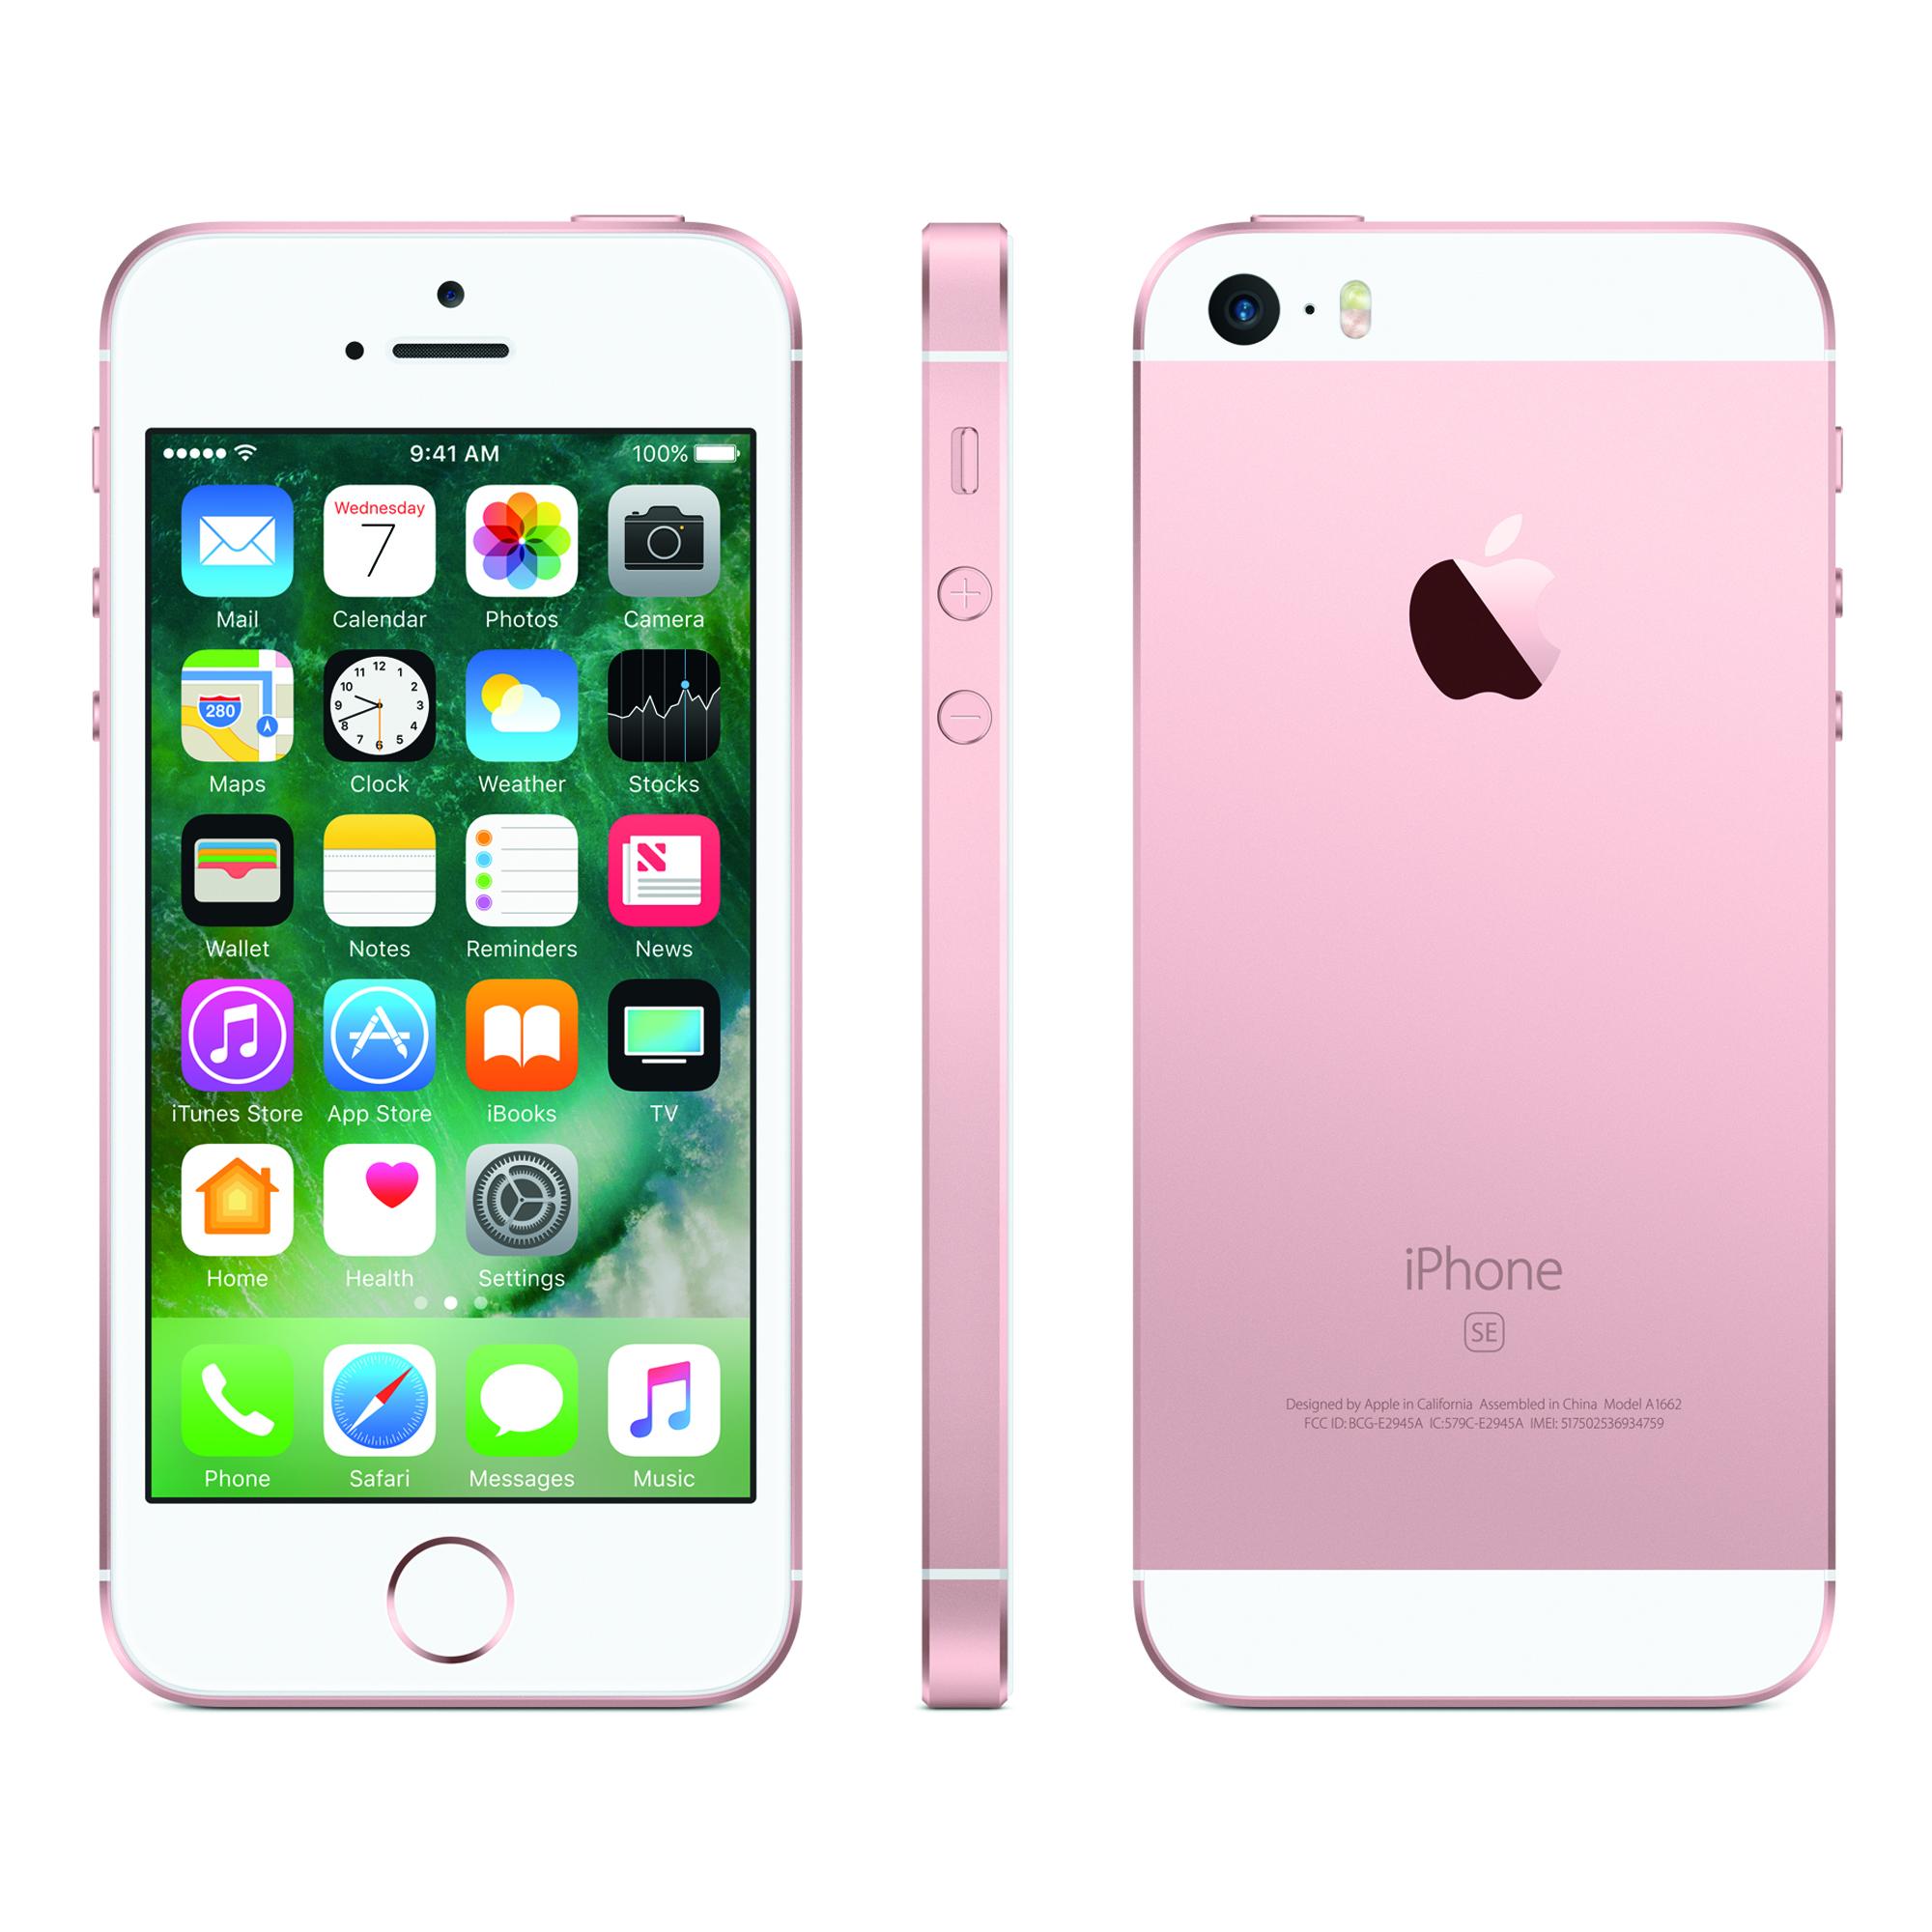 Refurbished Apple iPhone SE 32GB, Rose Gold - Straight Talk YMMV $76.29